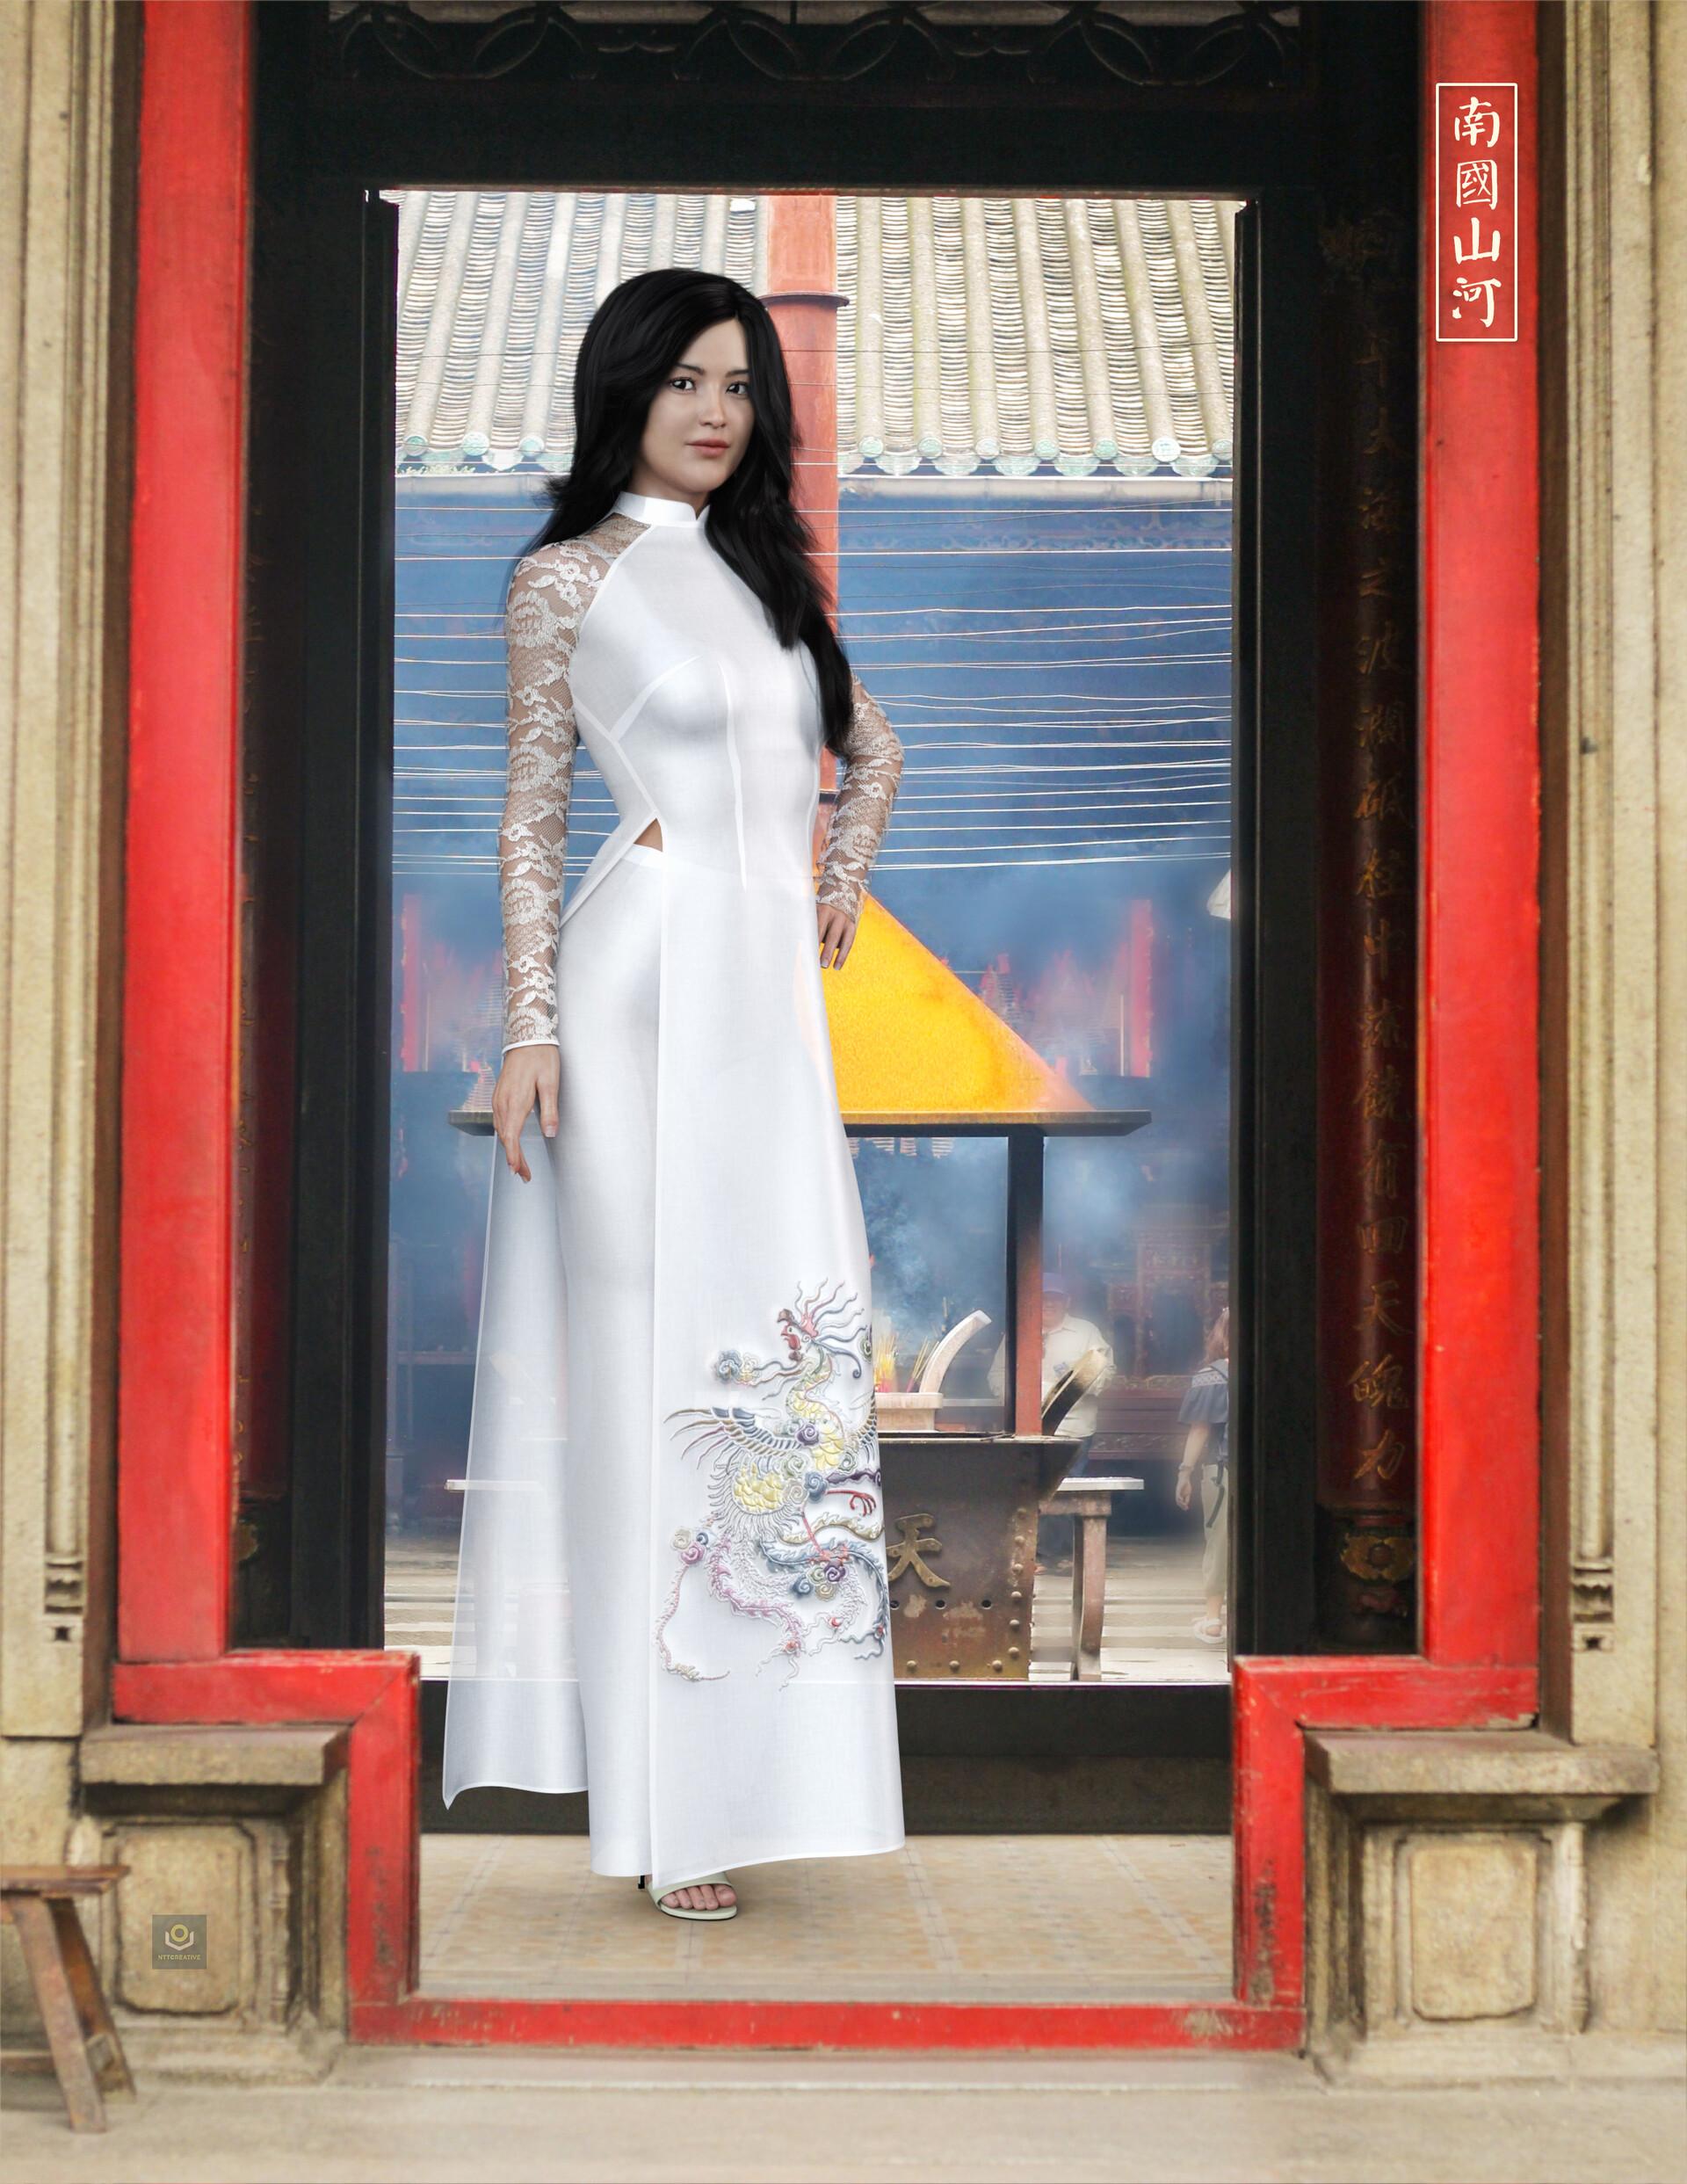 ArtStation - DAZ3D - Ao dai of Vietnamese , TU NGO TUAN